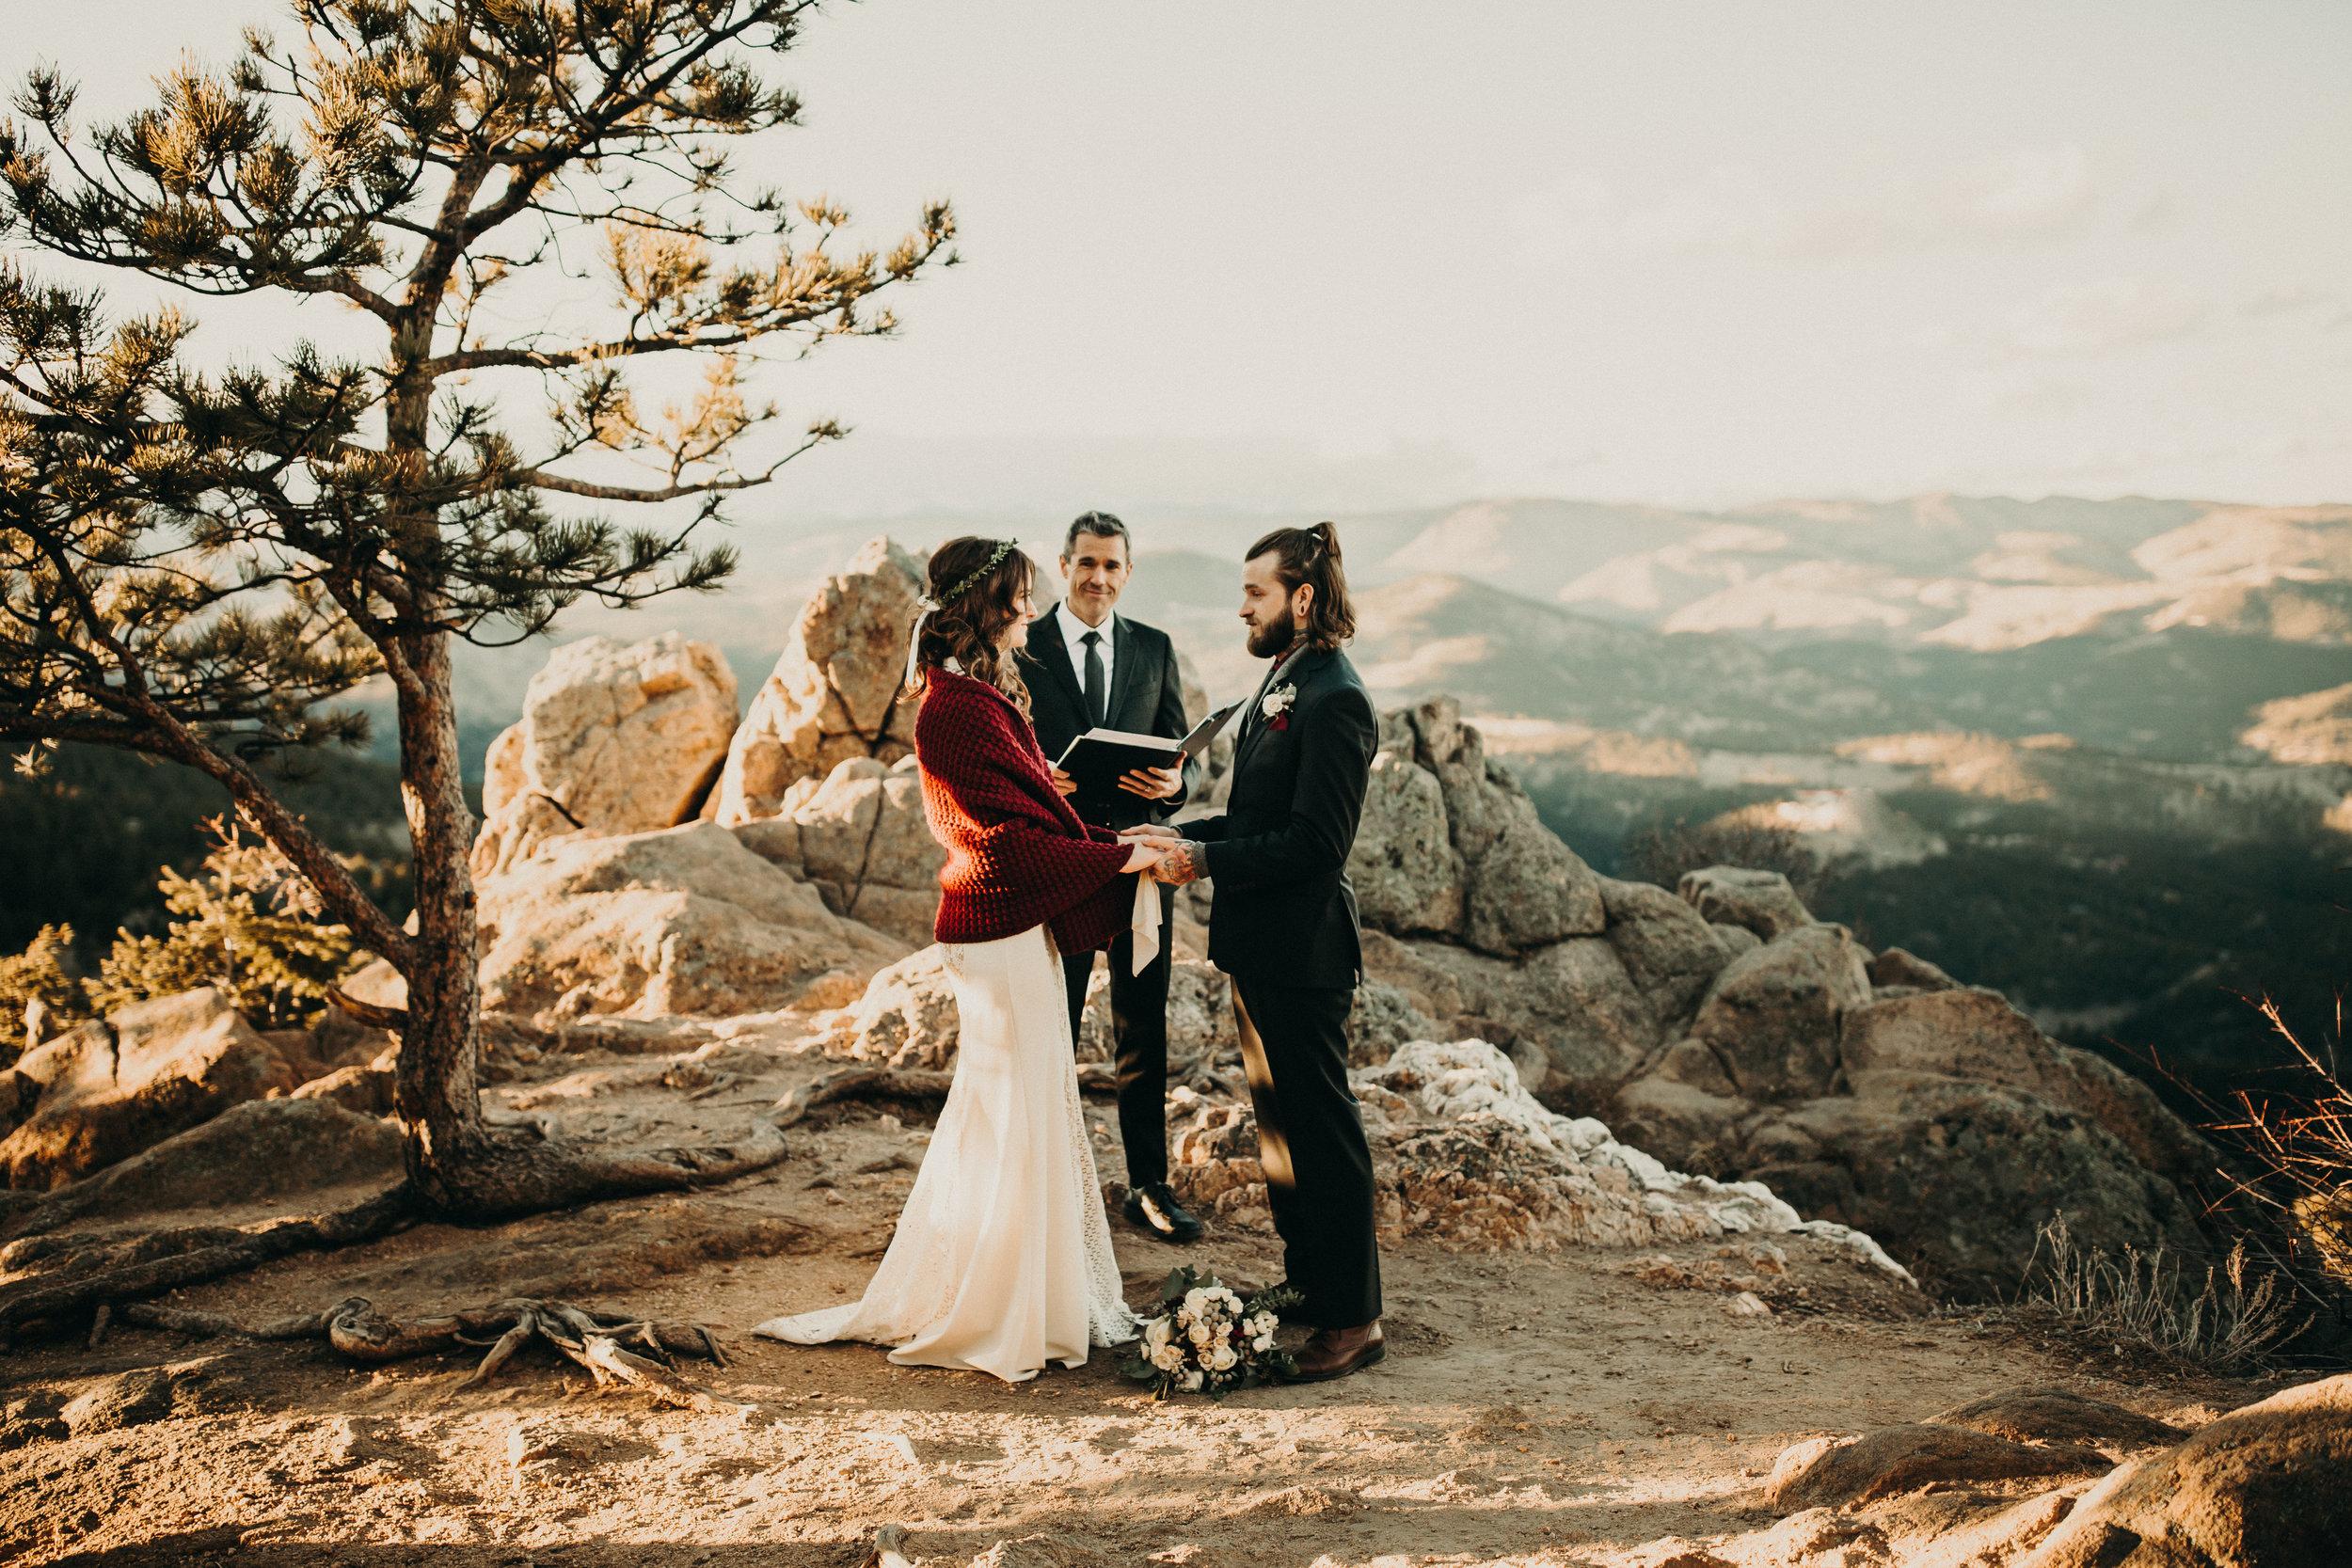 Boulder Elopement Ceremony